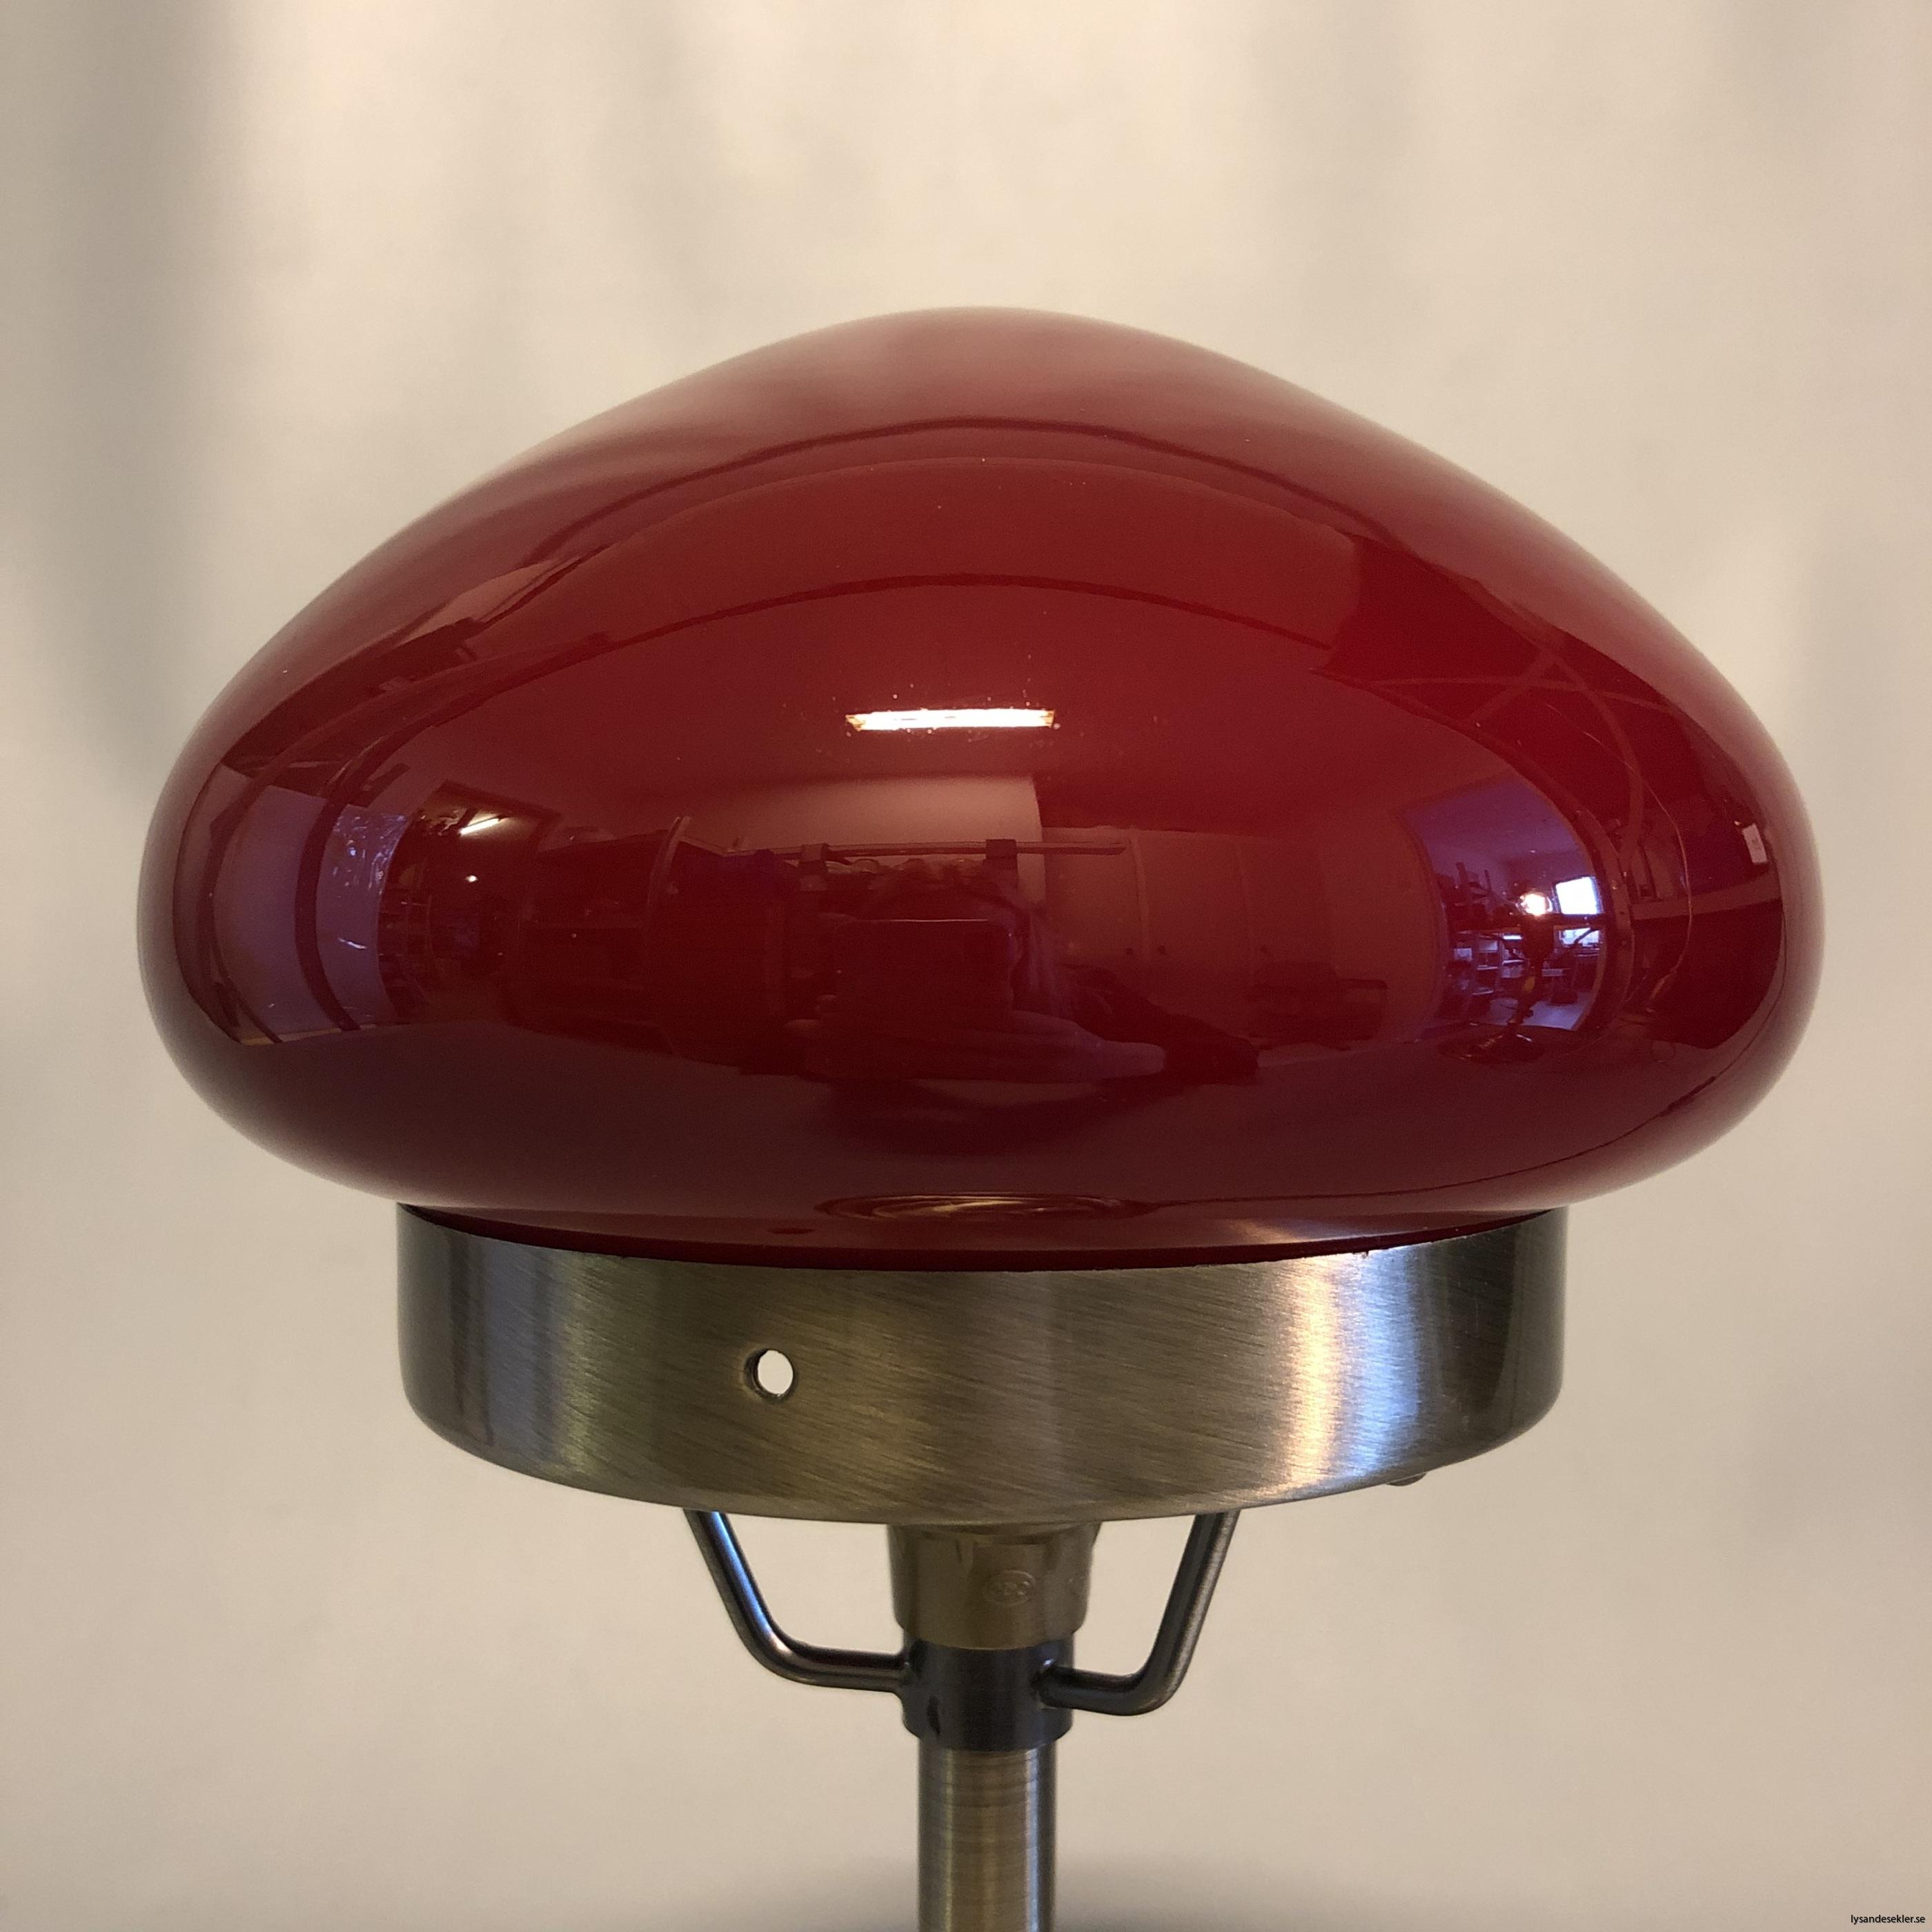 liten strindbergslampa 12 cm skärm12